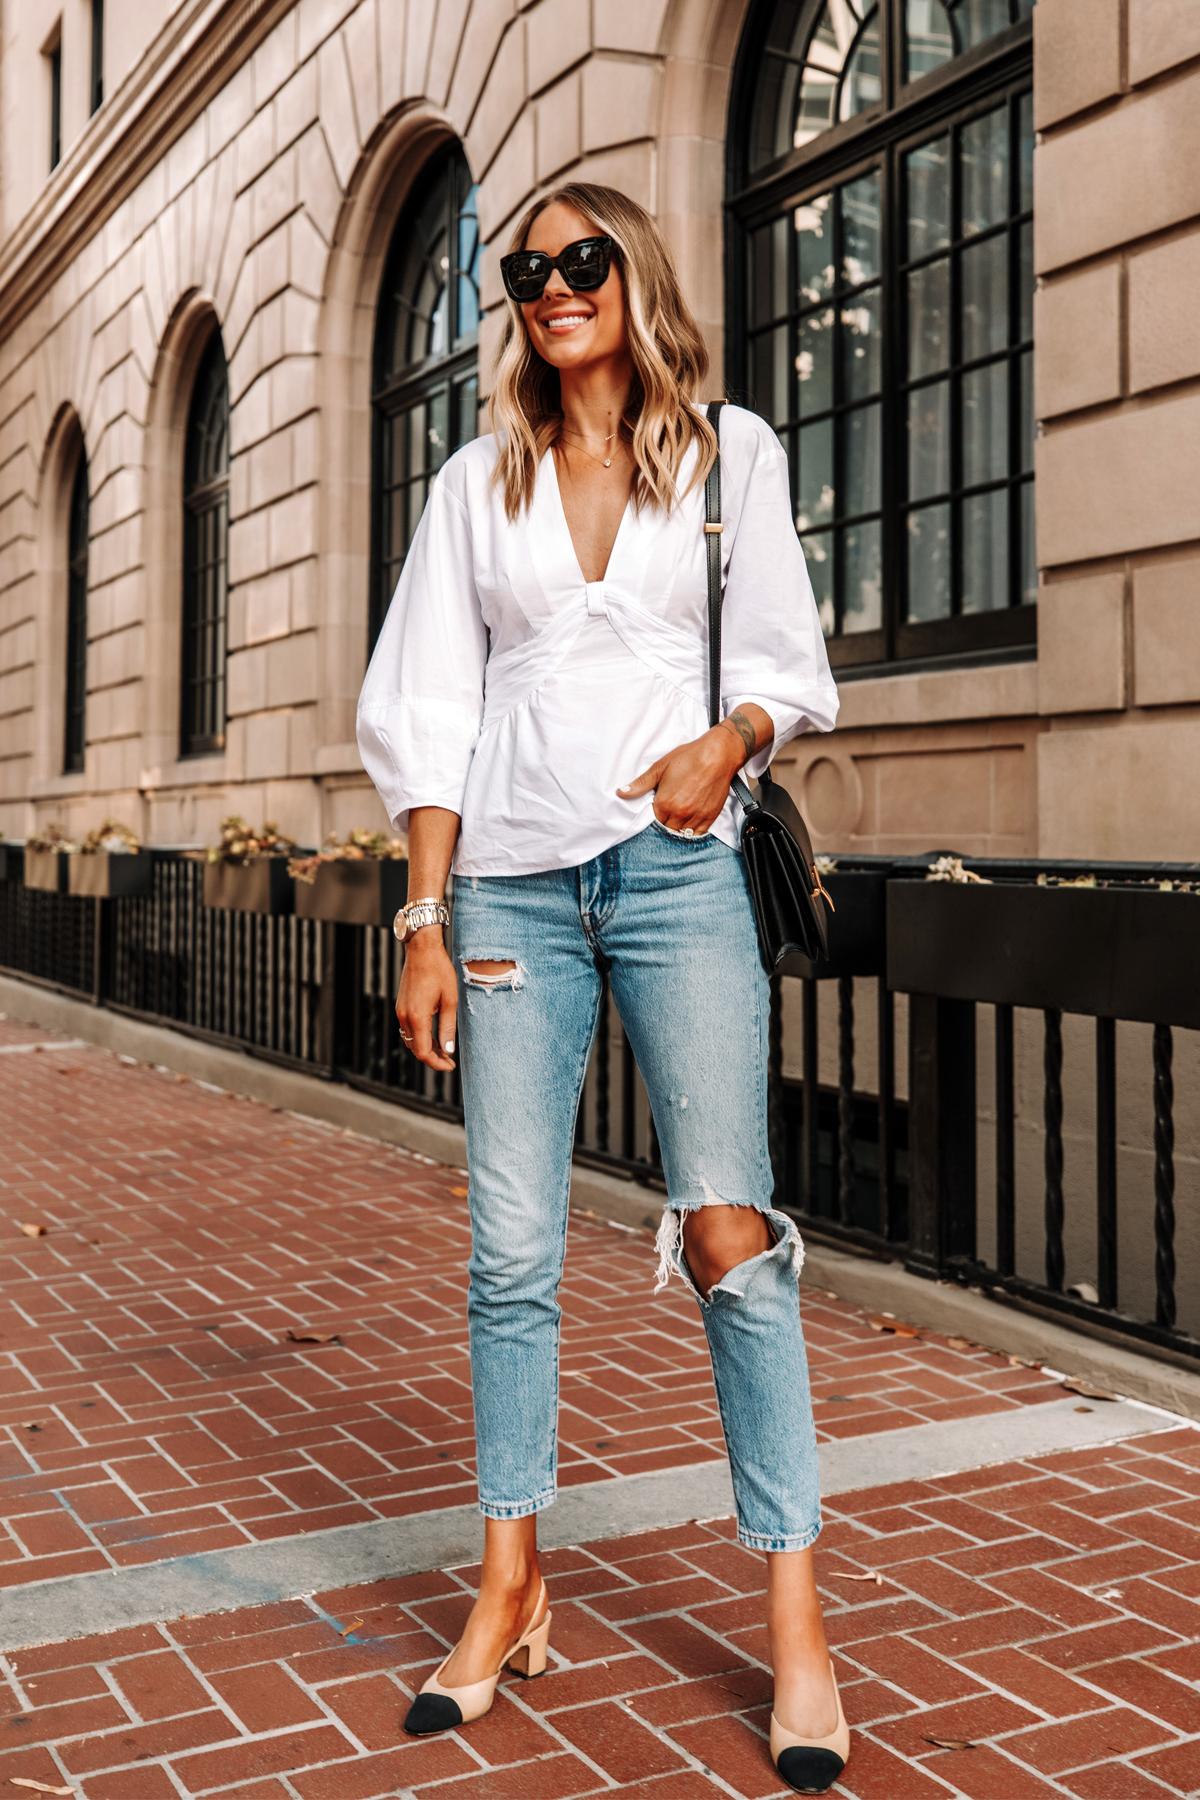 Fashion Jackson Wearing Derek Lam White Blouse Levis 501 Ripped Skinny Jeans Chanel Slingbacks 2